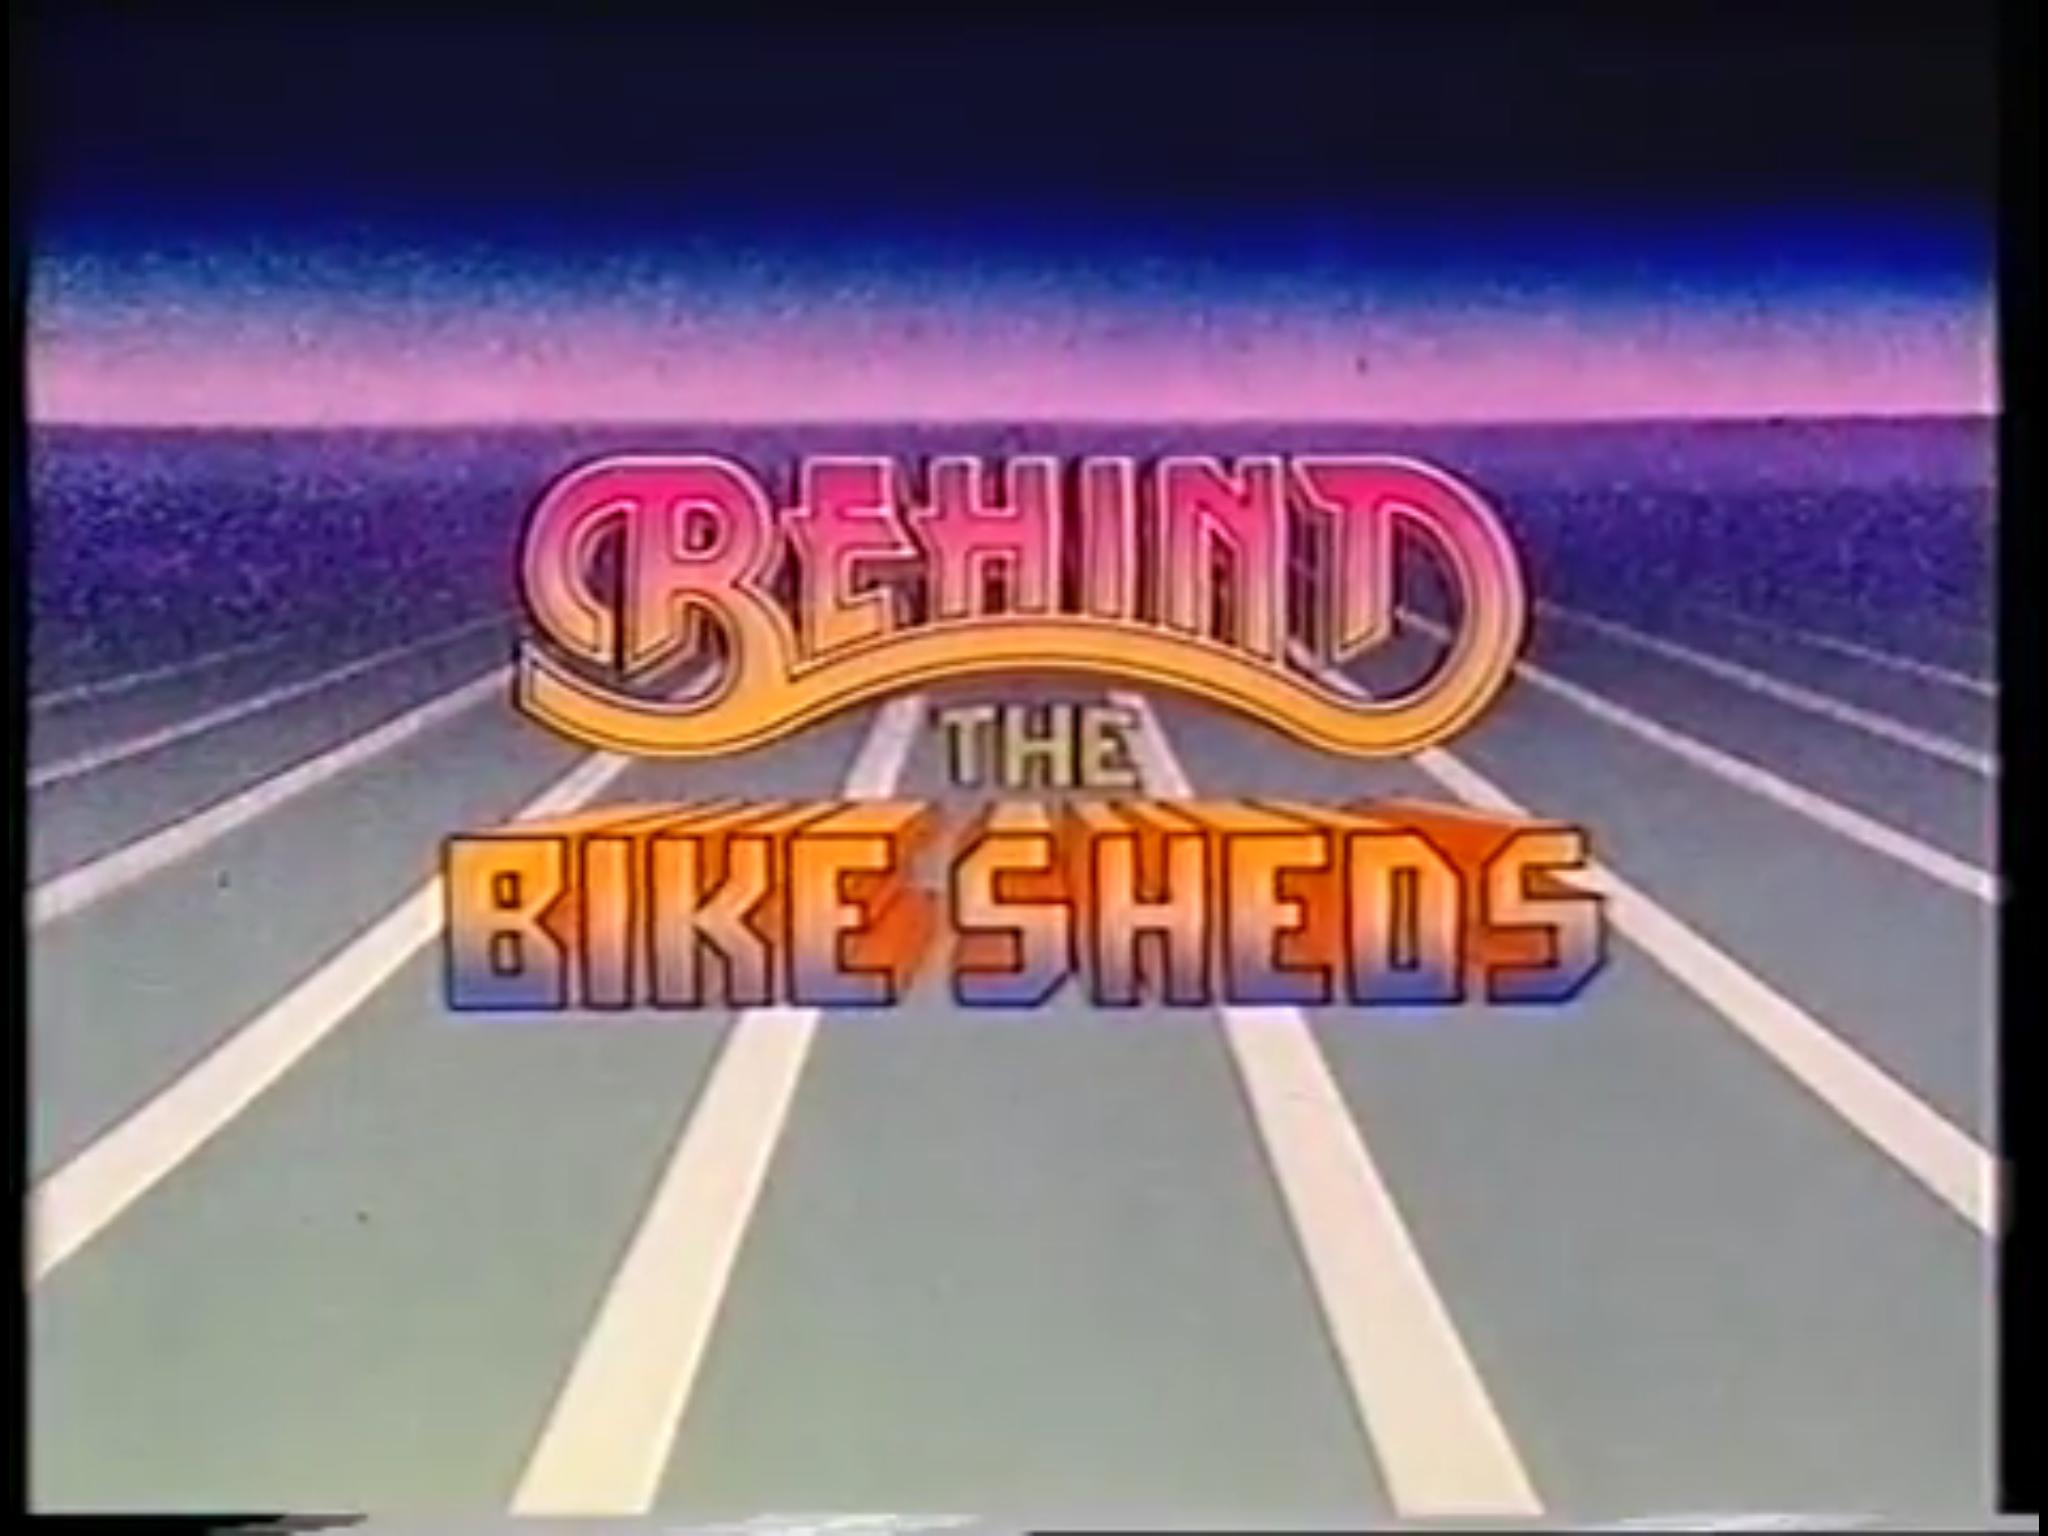 Behind the Bike Sheds